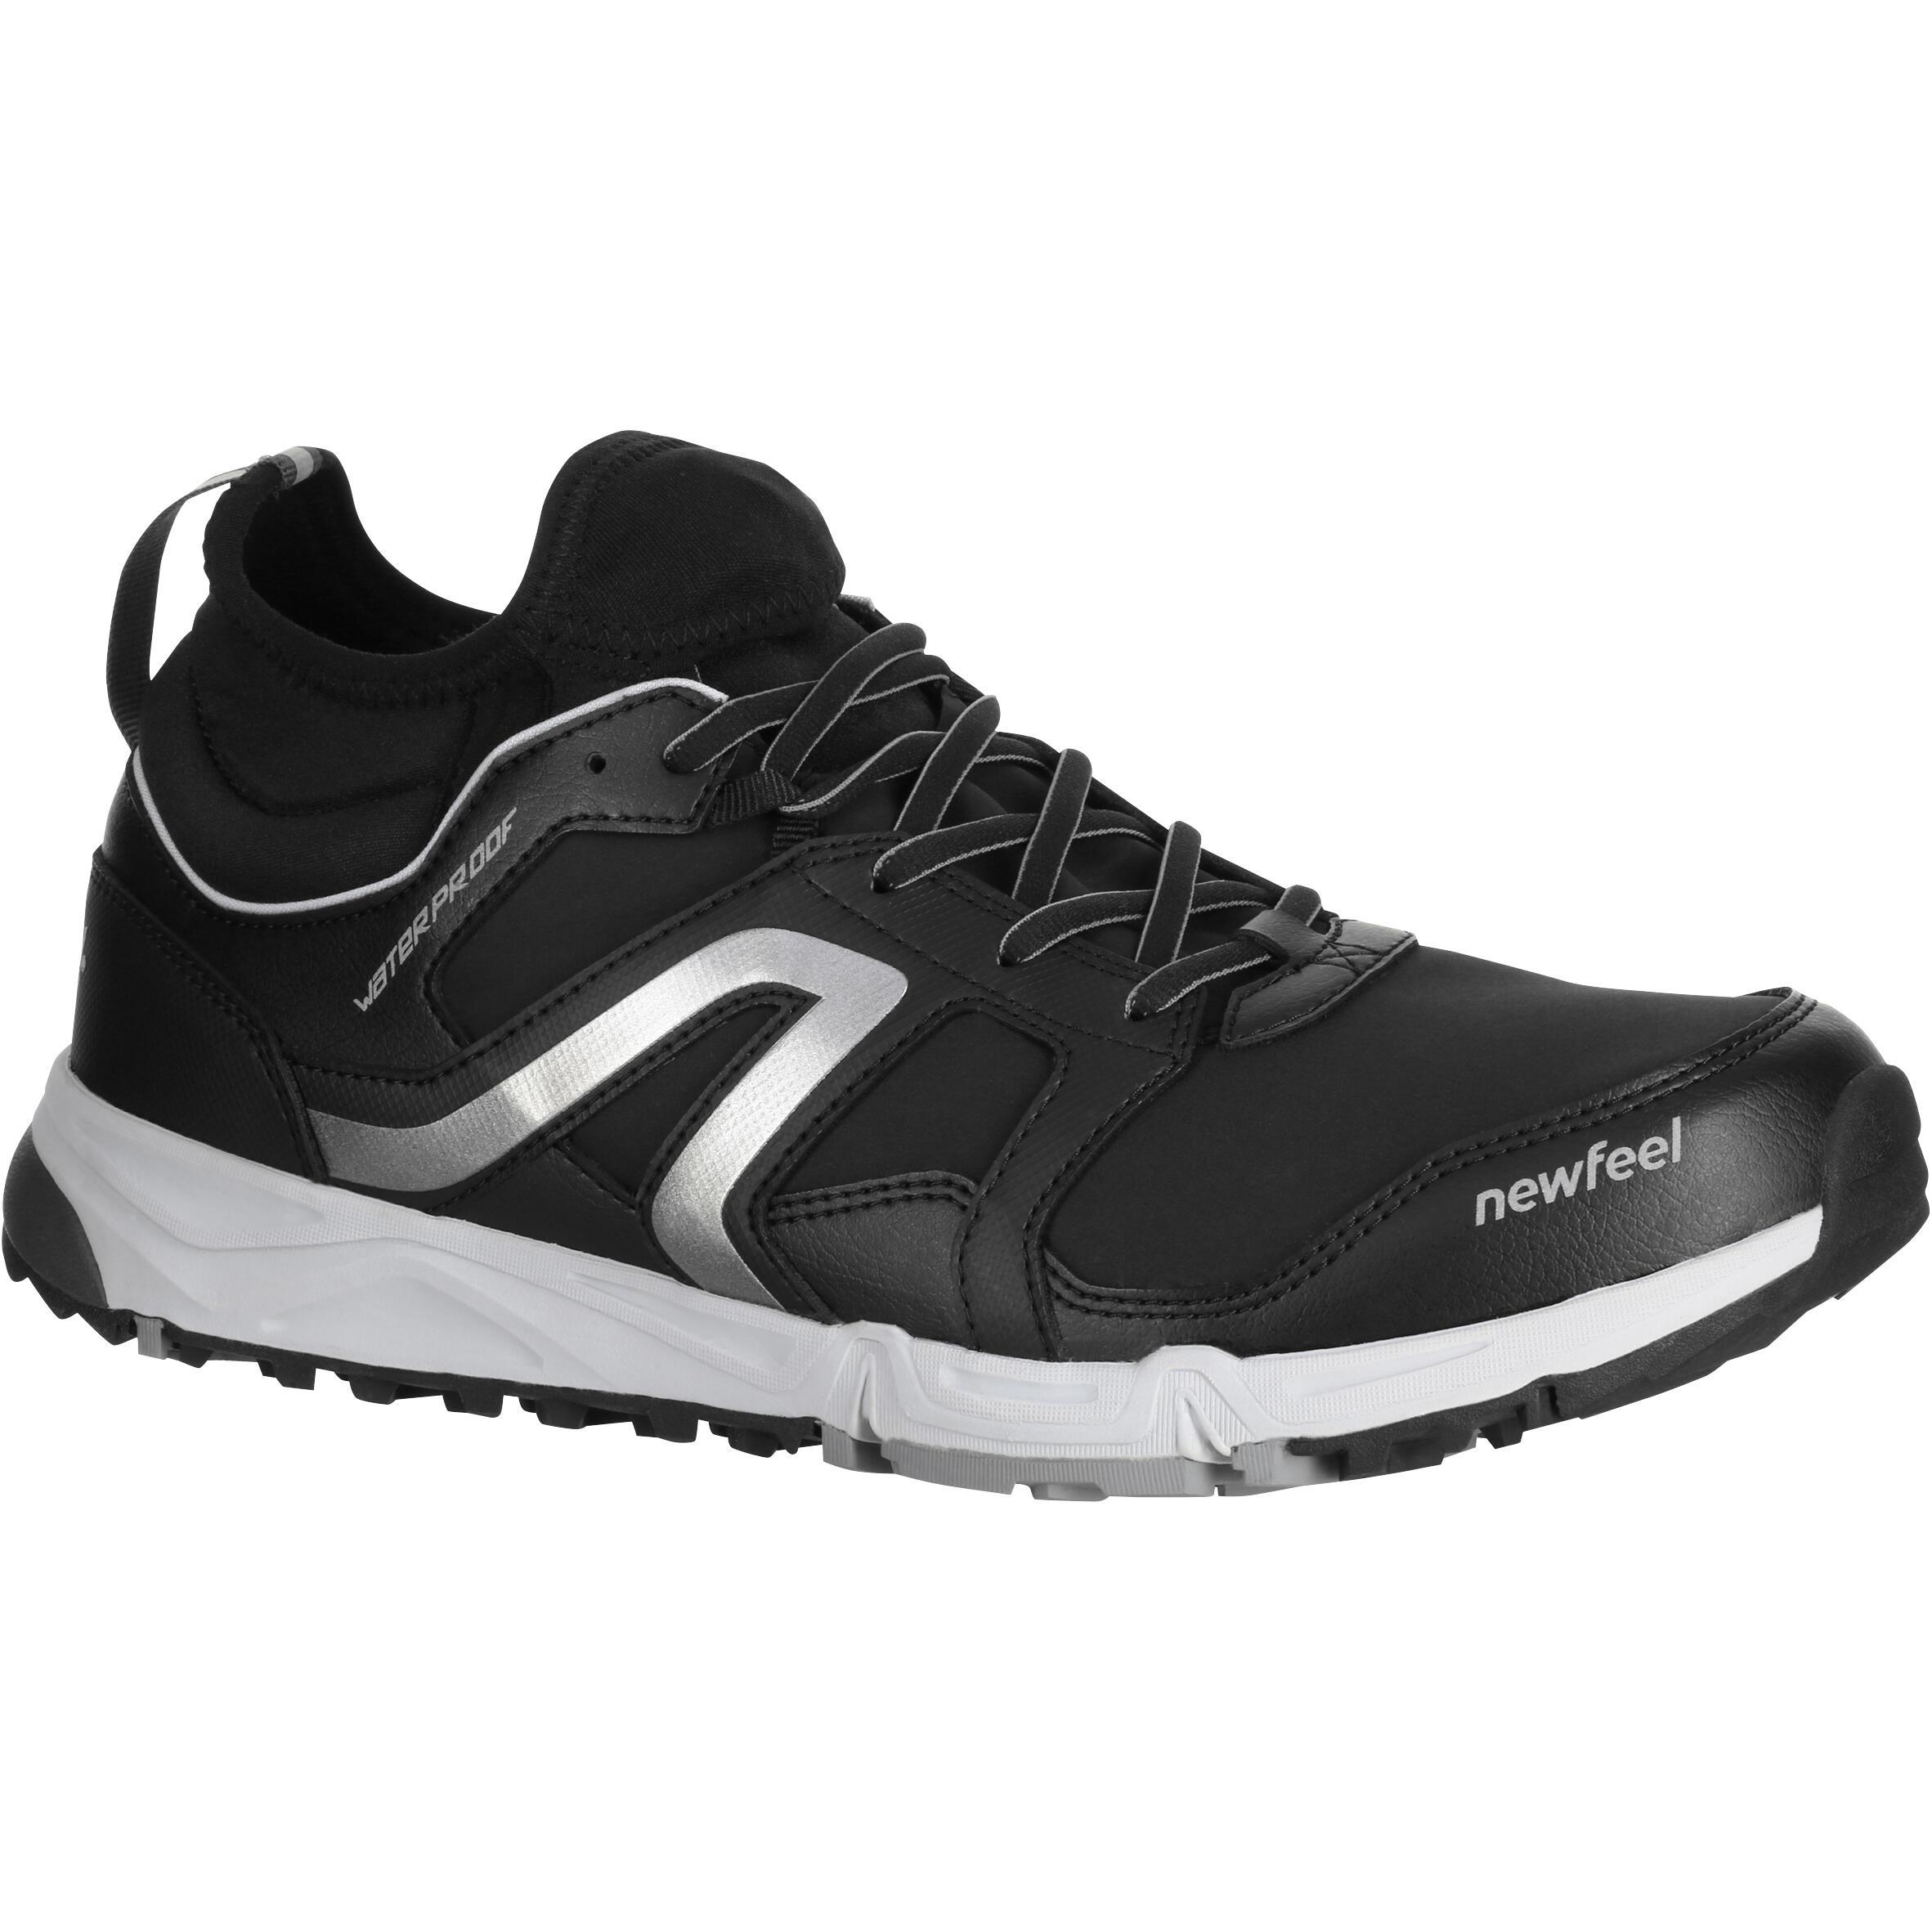 NordicWalkingschuhe NW580 FlexH wasserdicht Herren schwarz   Schuhe > Sportschuhe > Walkingschuhe   Newfeel